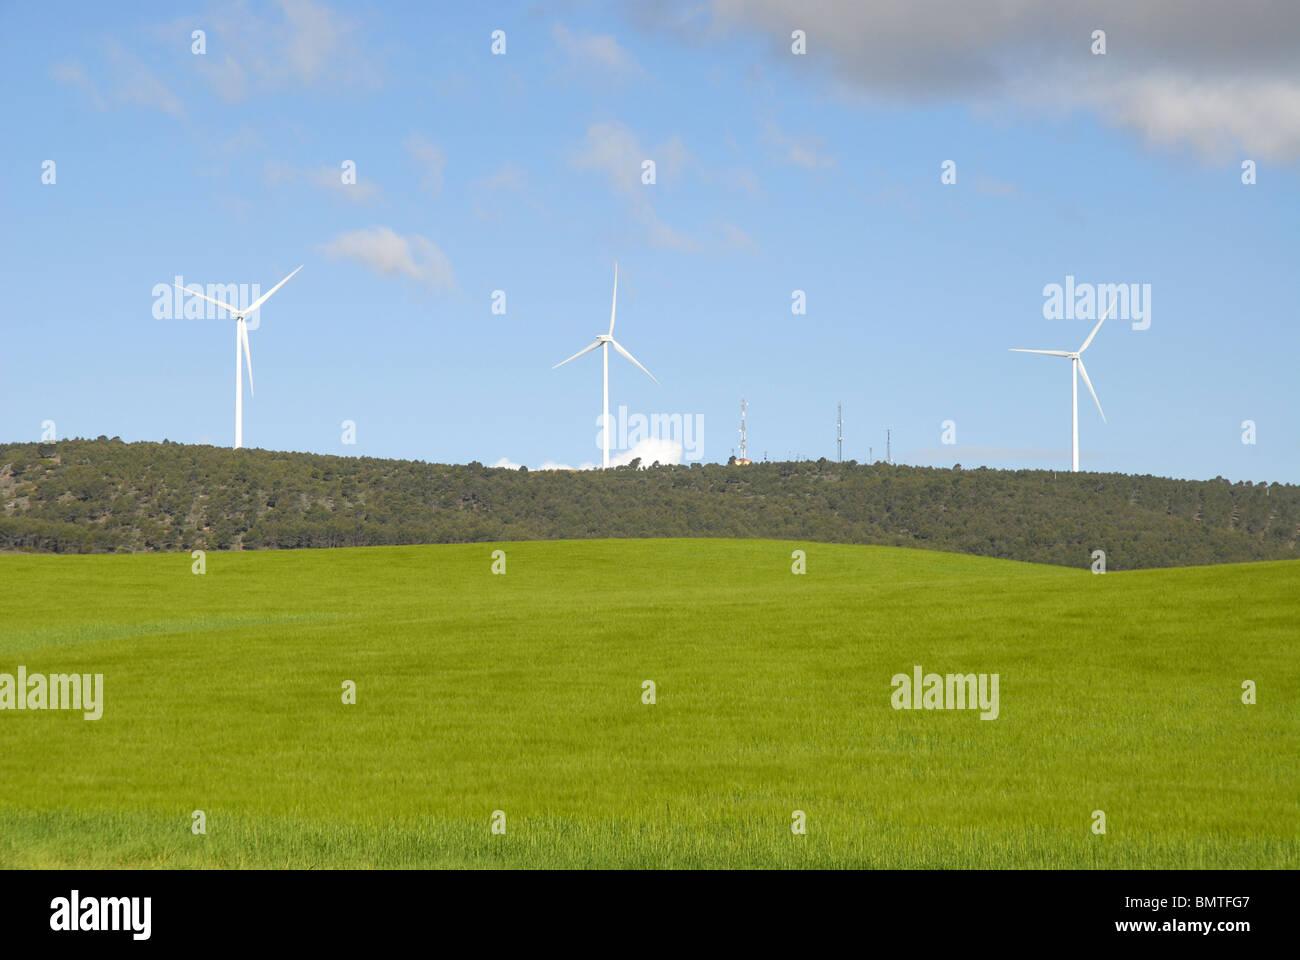 view over wheat fields to aerogenerators on the horizon, near Huete, Cuenca Province, Castile-La Mancha, Spain - Stock Image